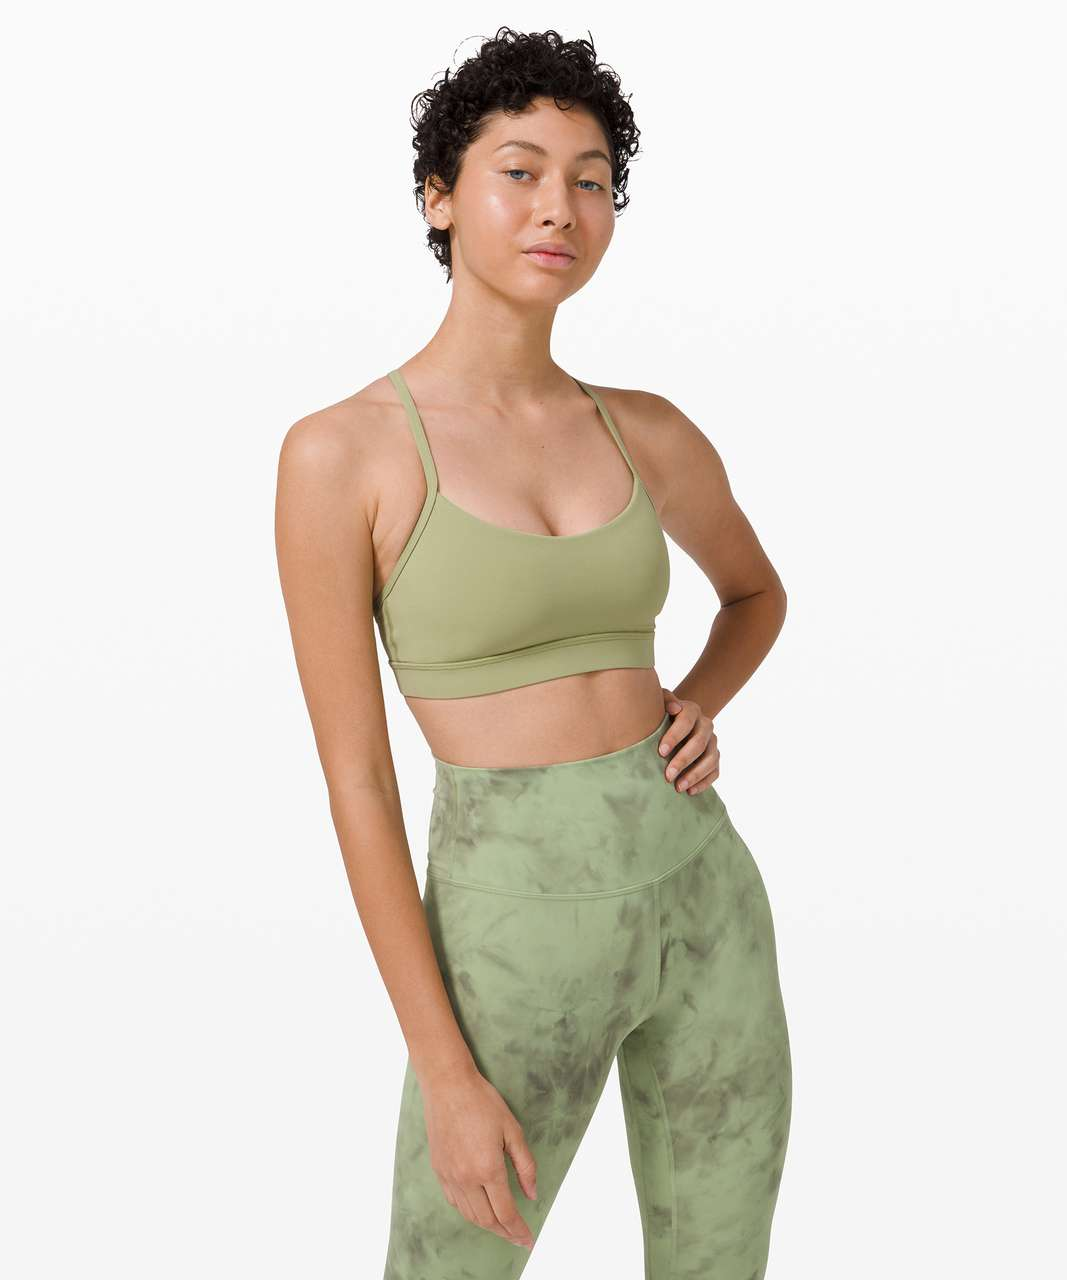 Lululemon Flow Y Bra Nulu *Light Support, B/C Cup - Vista Green